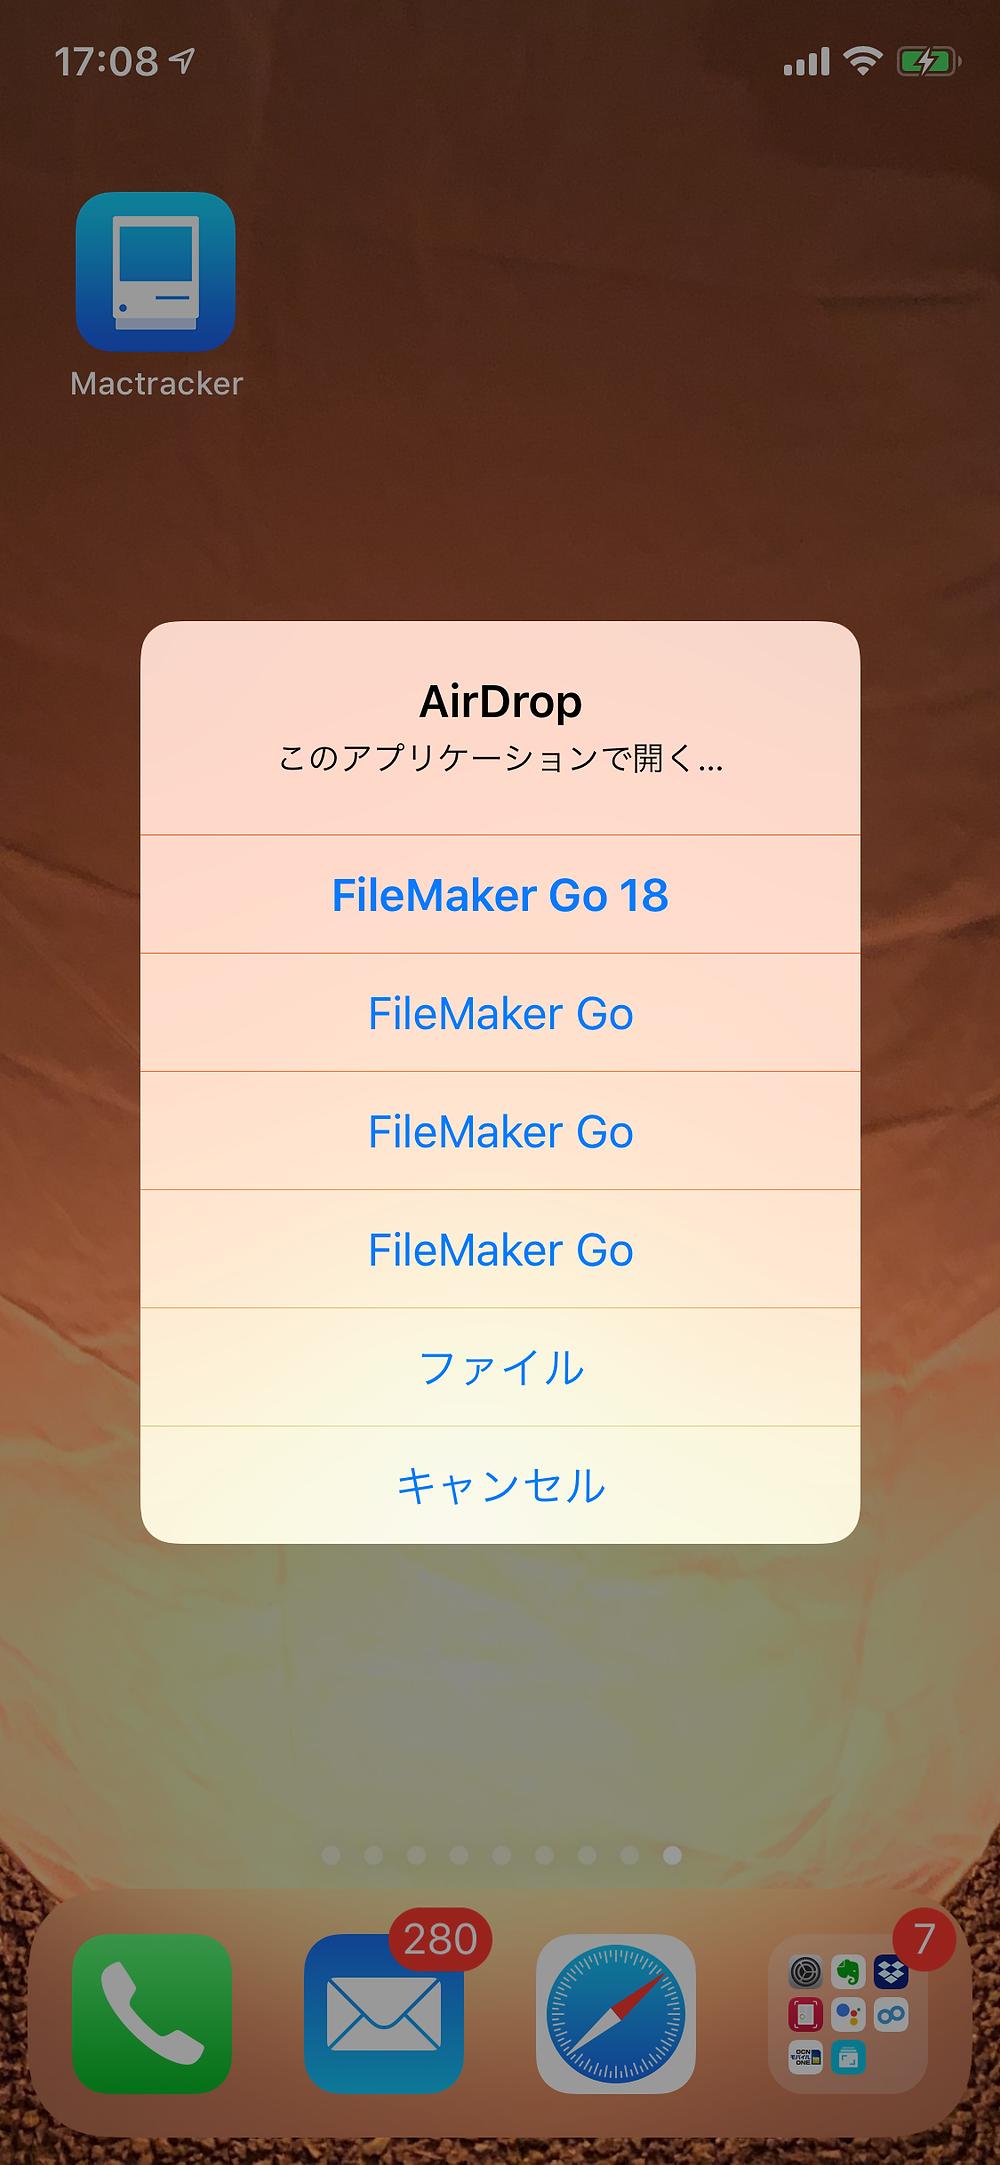 FileMaker Go AirDrop受取